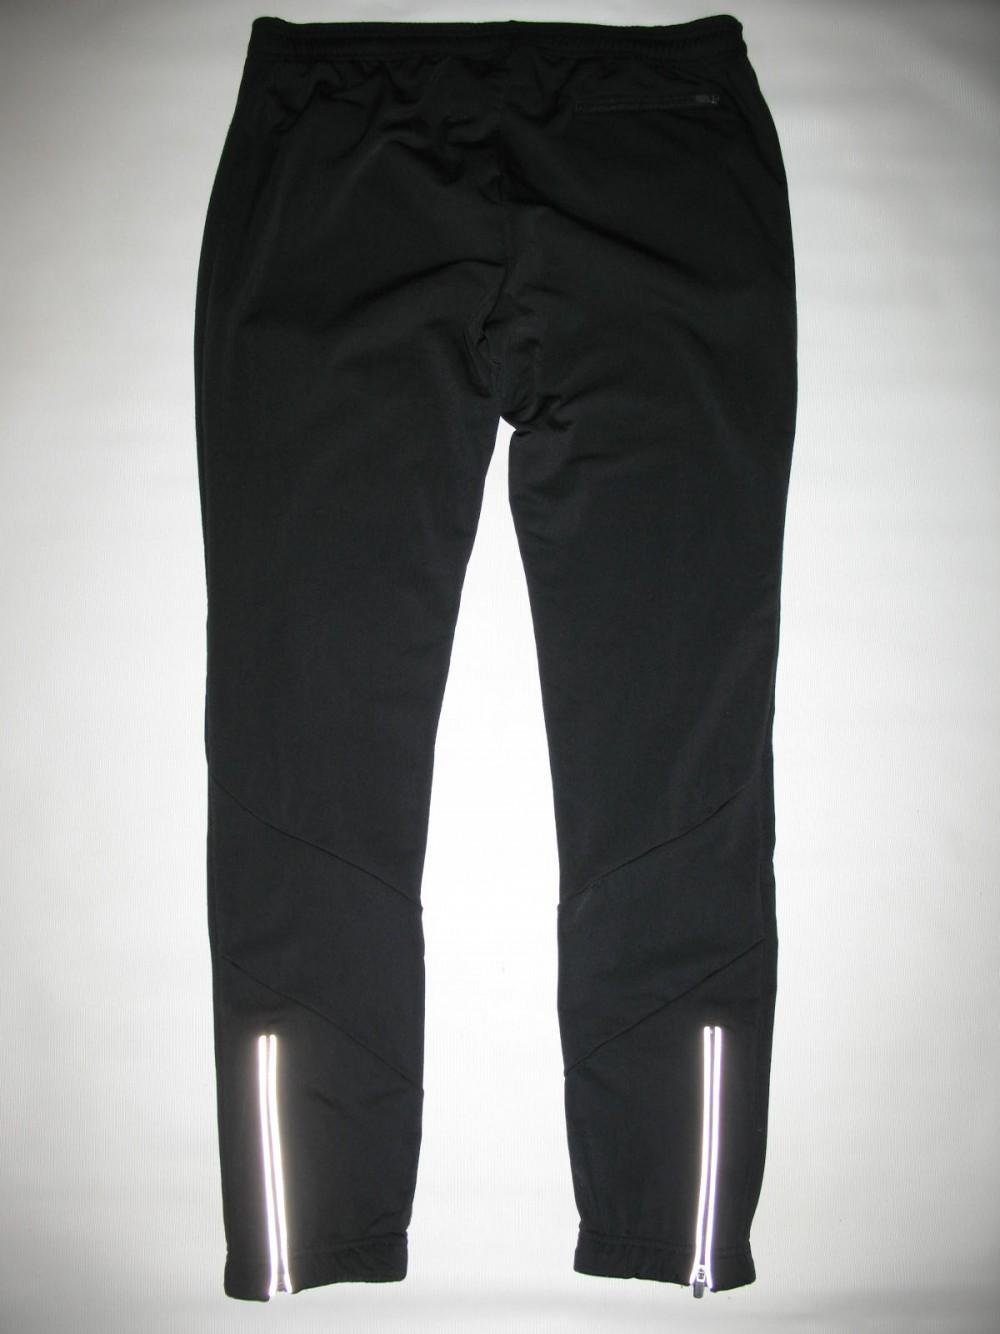 Штаны CRANE adventure run/cycling pants (размер 54-XL/XXL) - 2